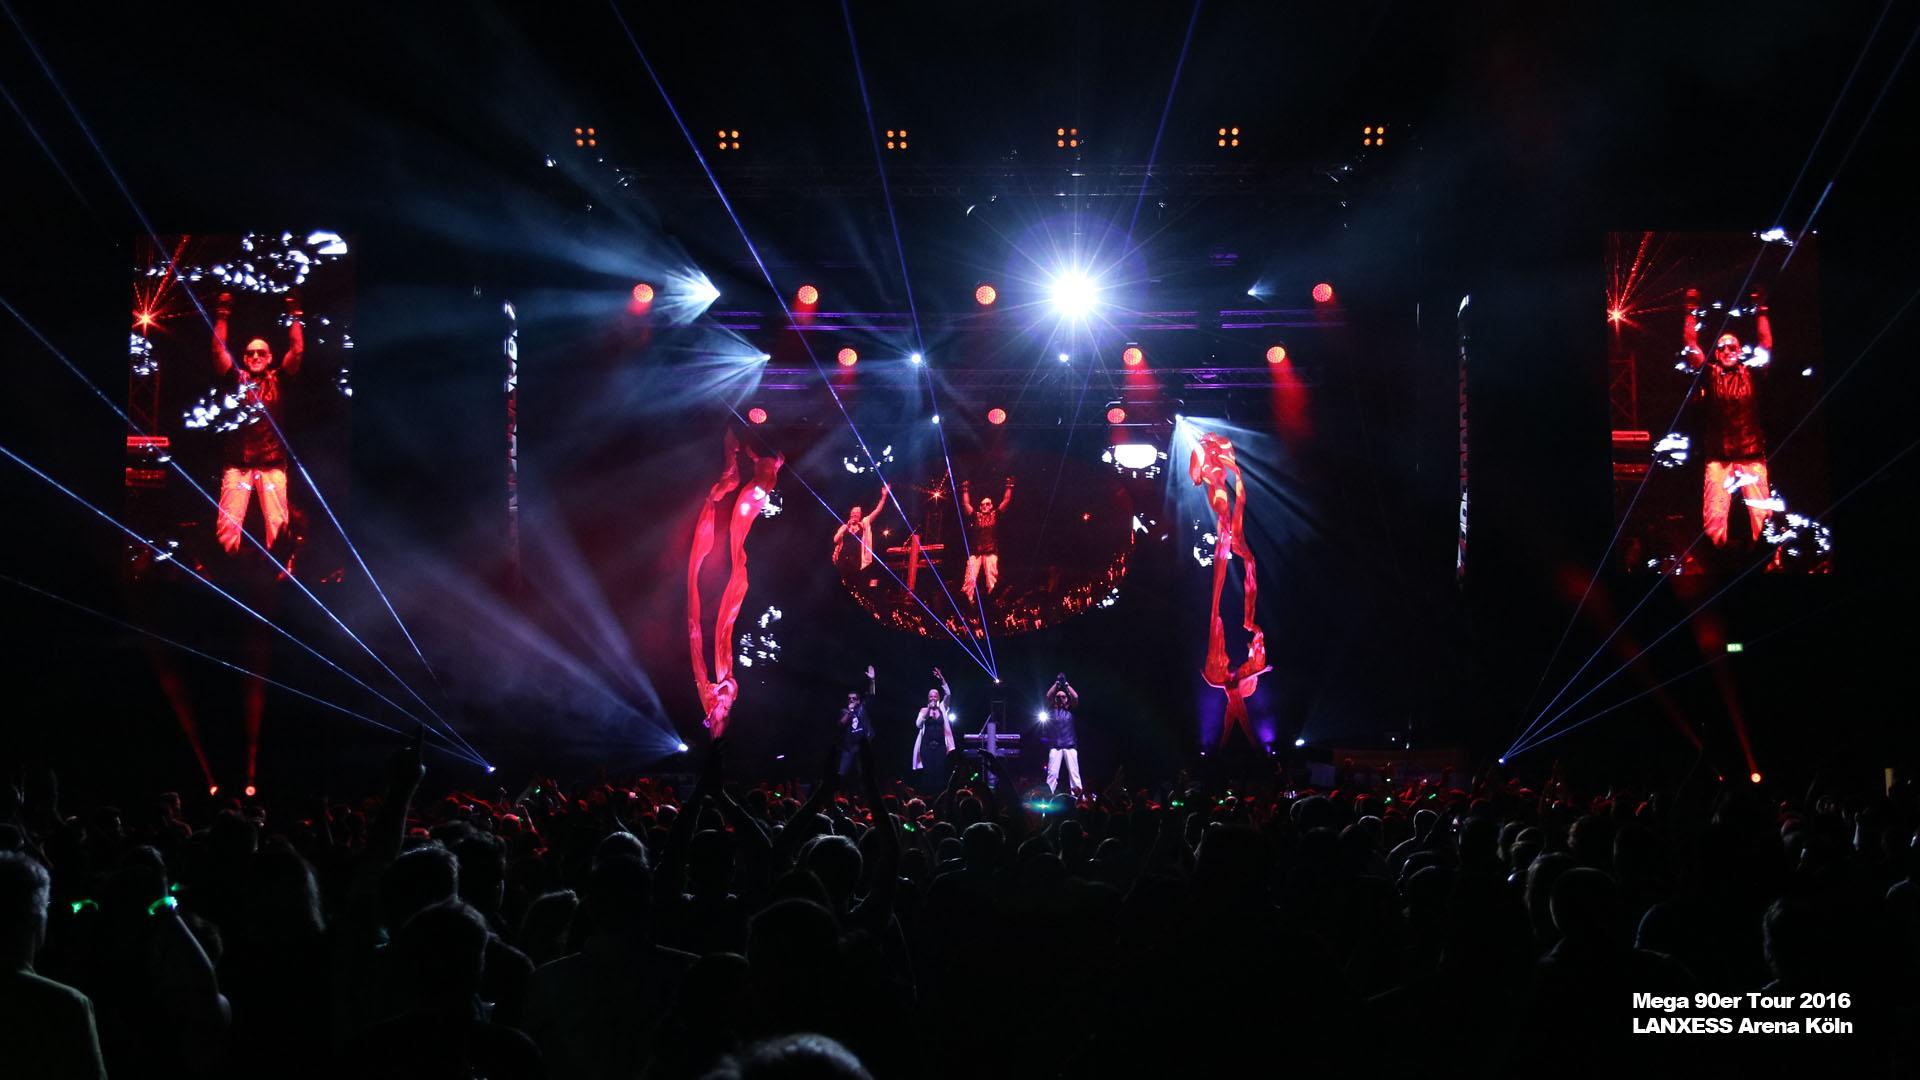 Mega-90er-Tour-2016